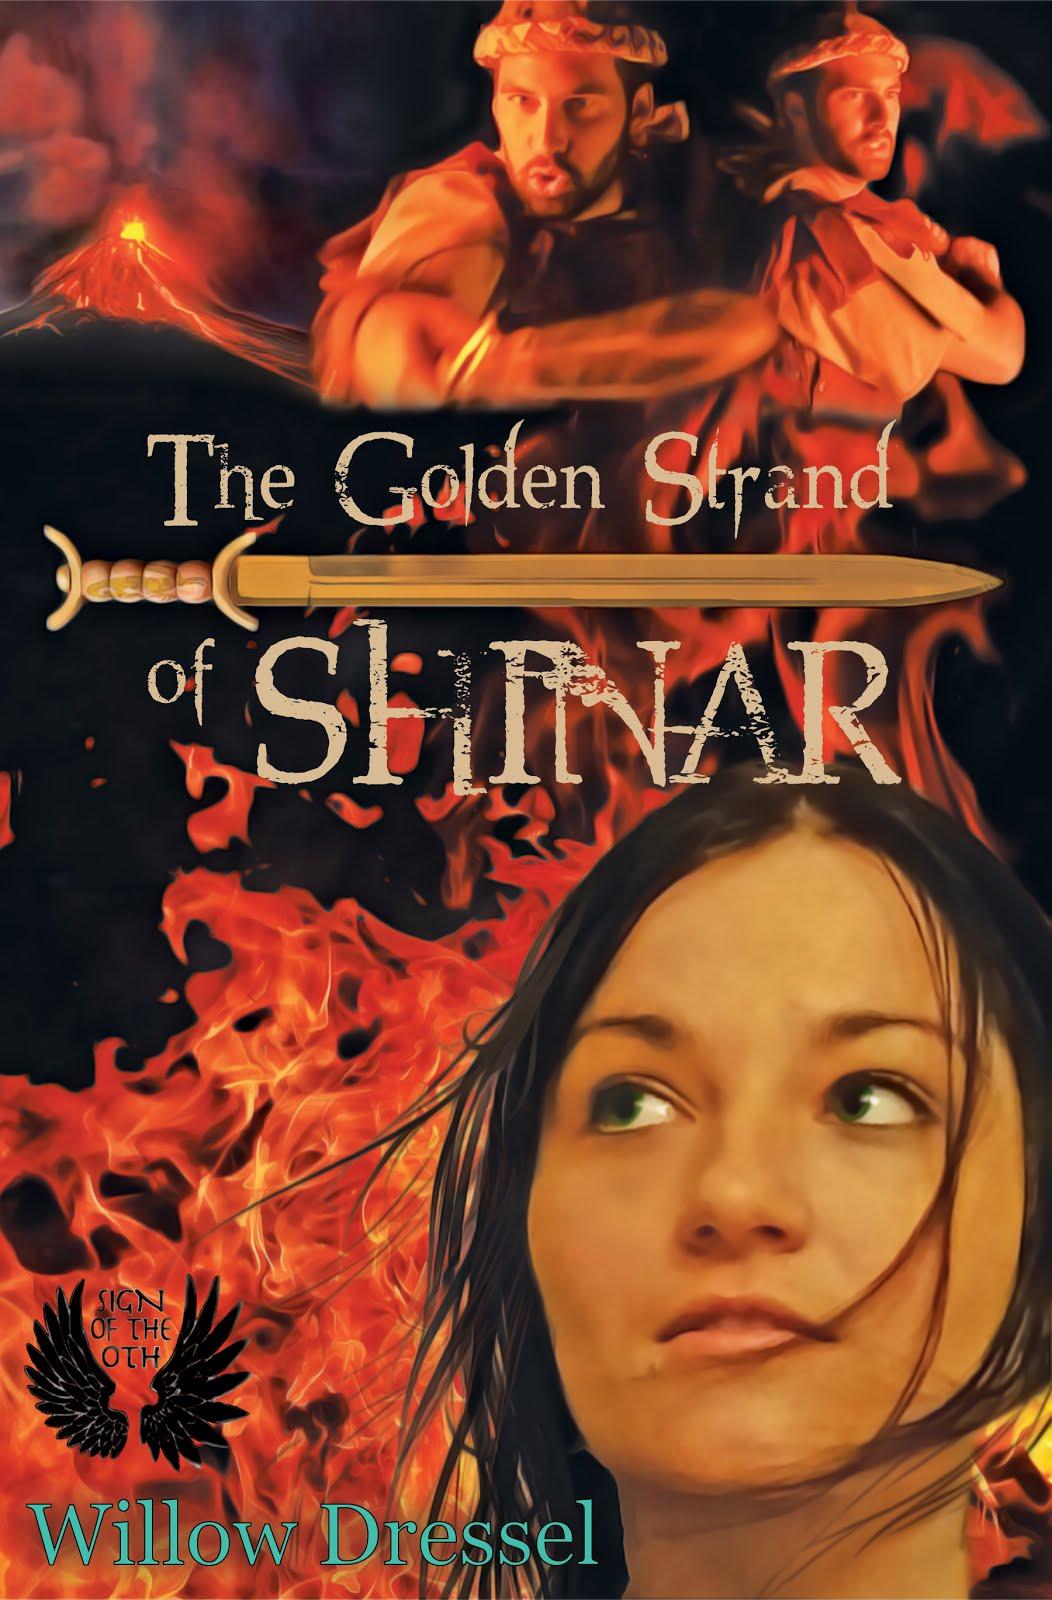 THE GOLDEN STRAND OF SHINAR